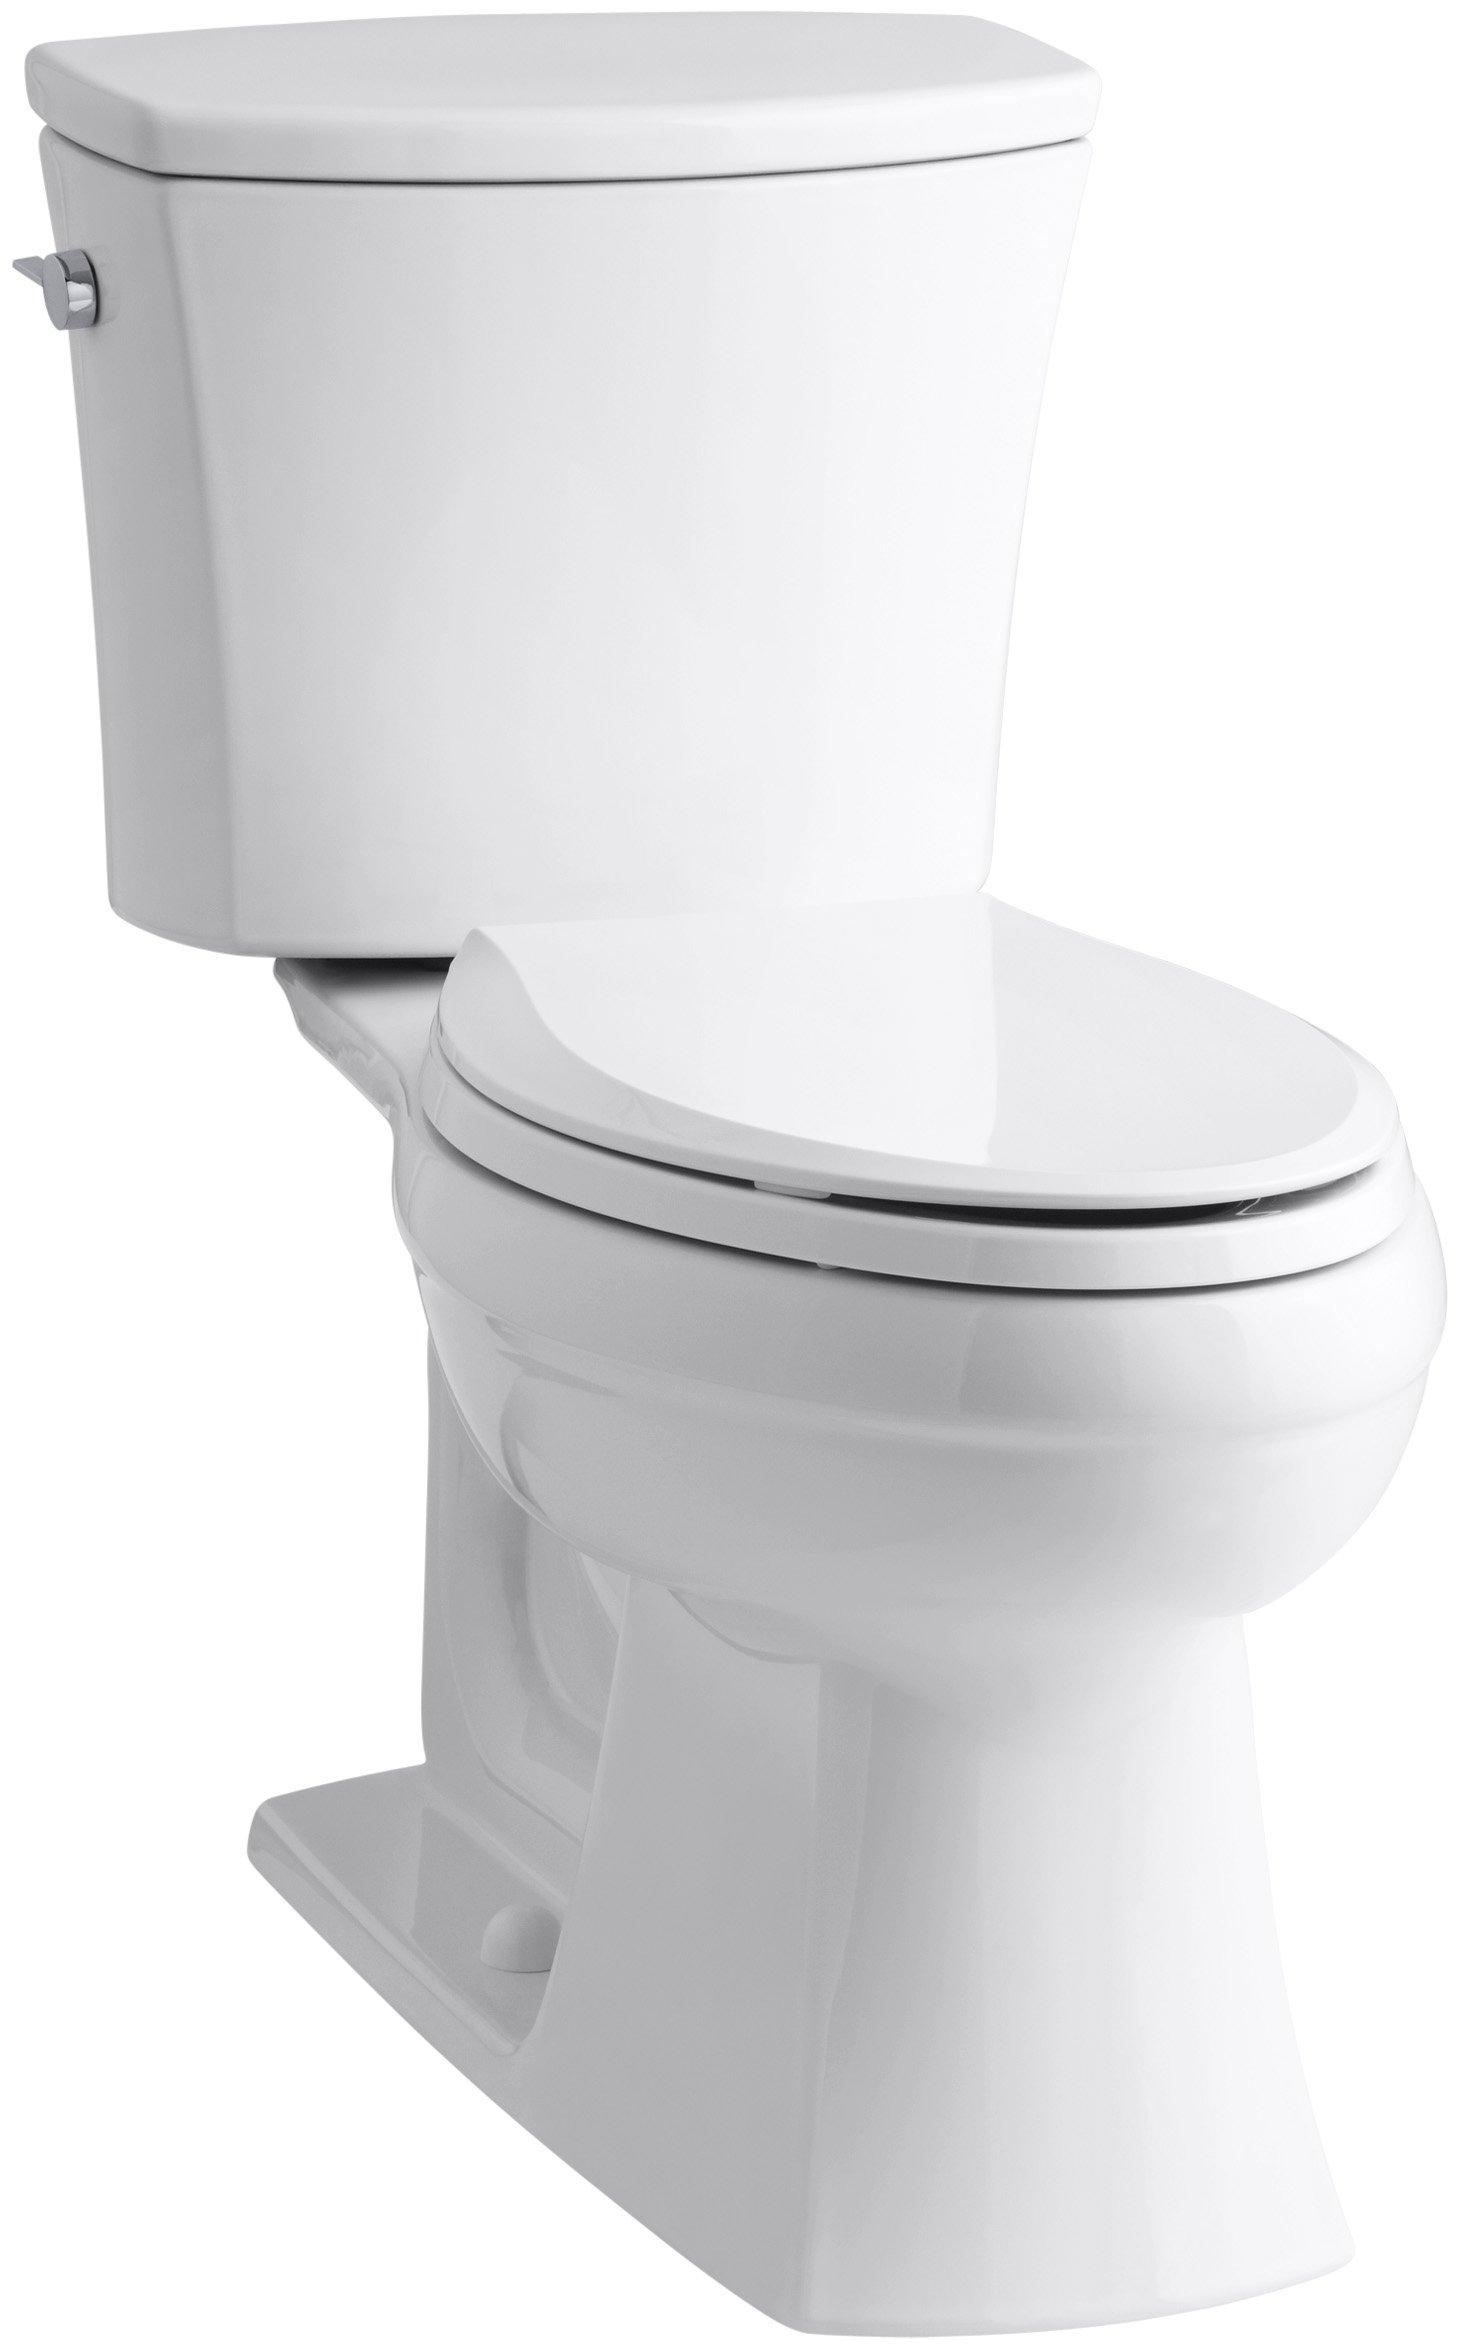 KOHLER K-3754-0 Kelston Comfort Height Two-Piece Elongated 1.6 GPF Toilet with AquaPiston Flush Technology and Left-Hand Trip Lever, White by Kohler